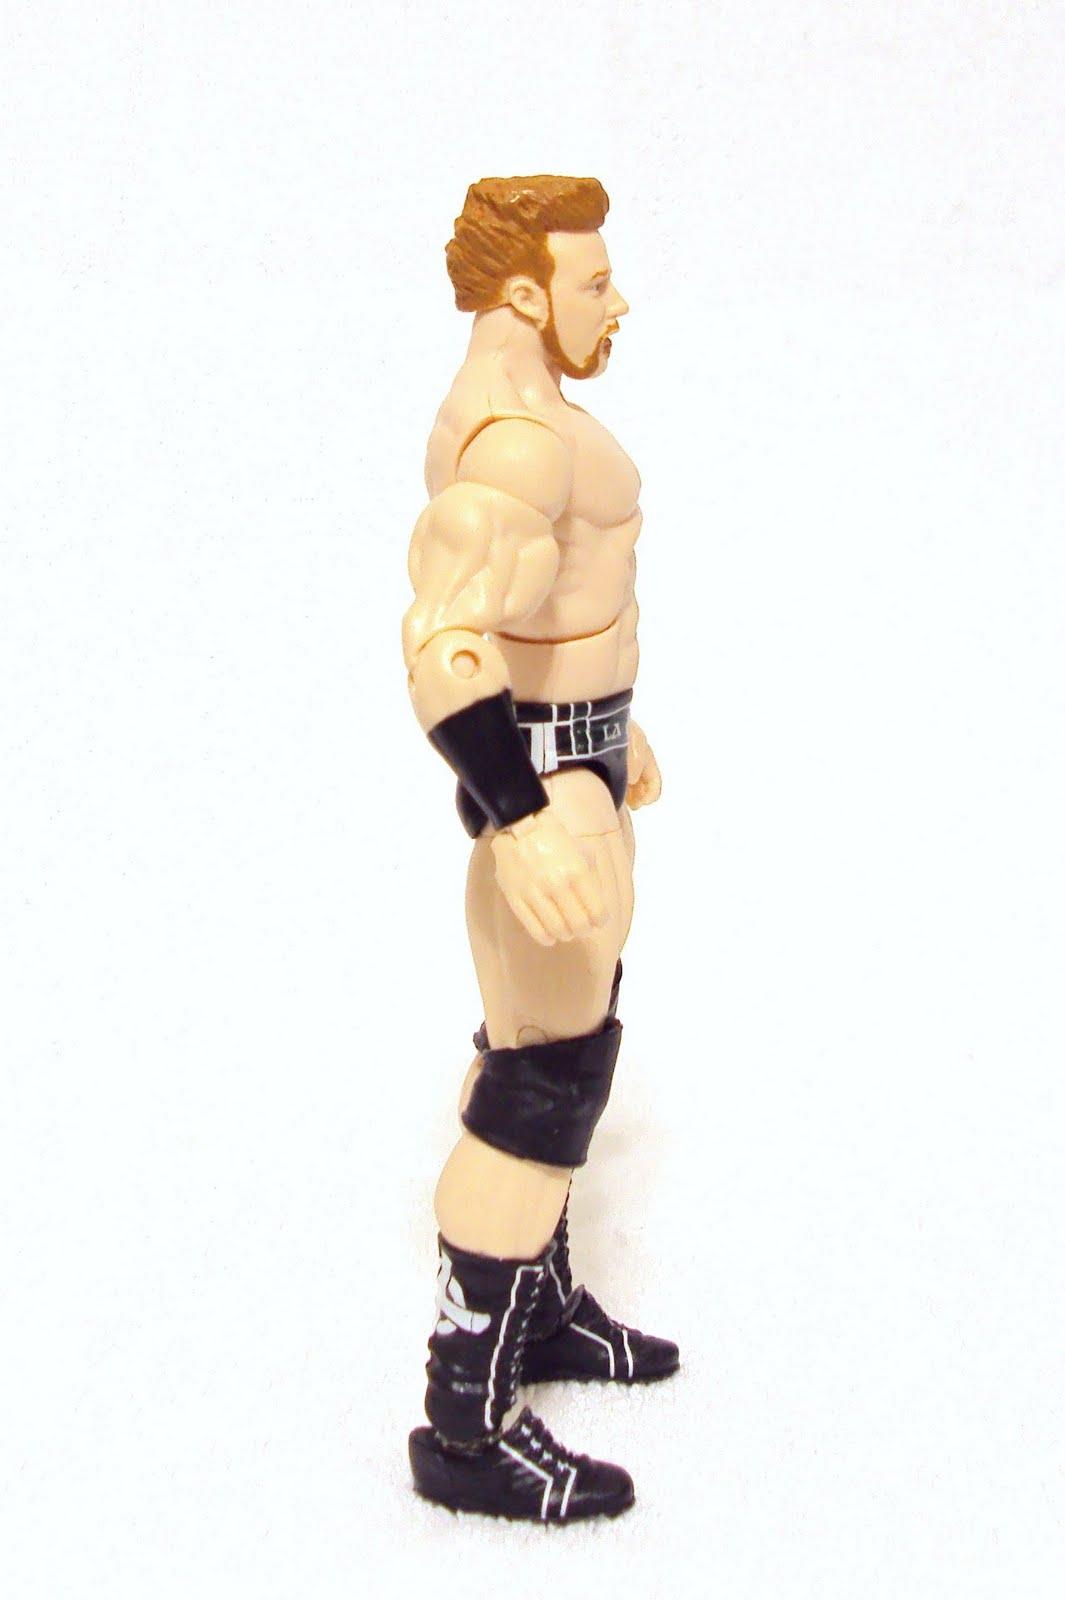 3B's Toy Hive: WWE Elite, Sheamus - Review